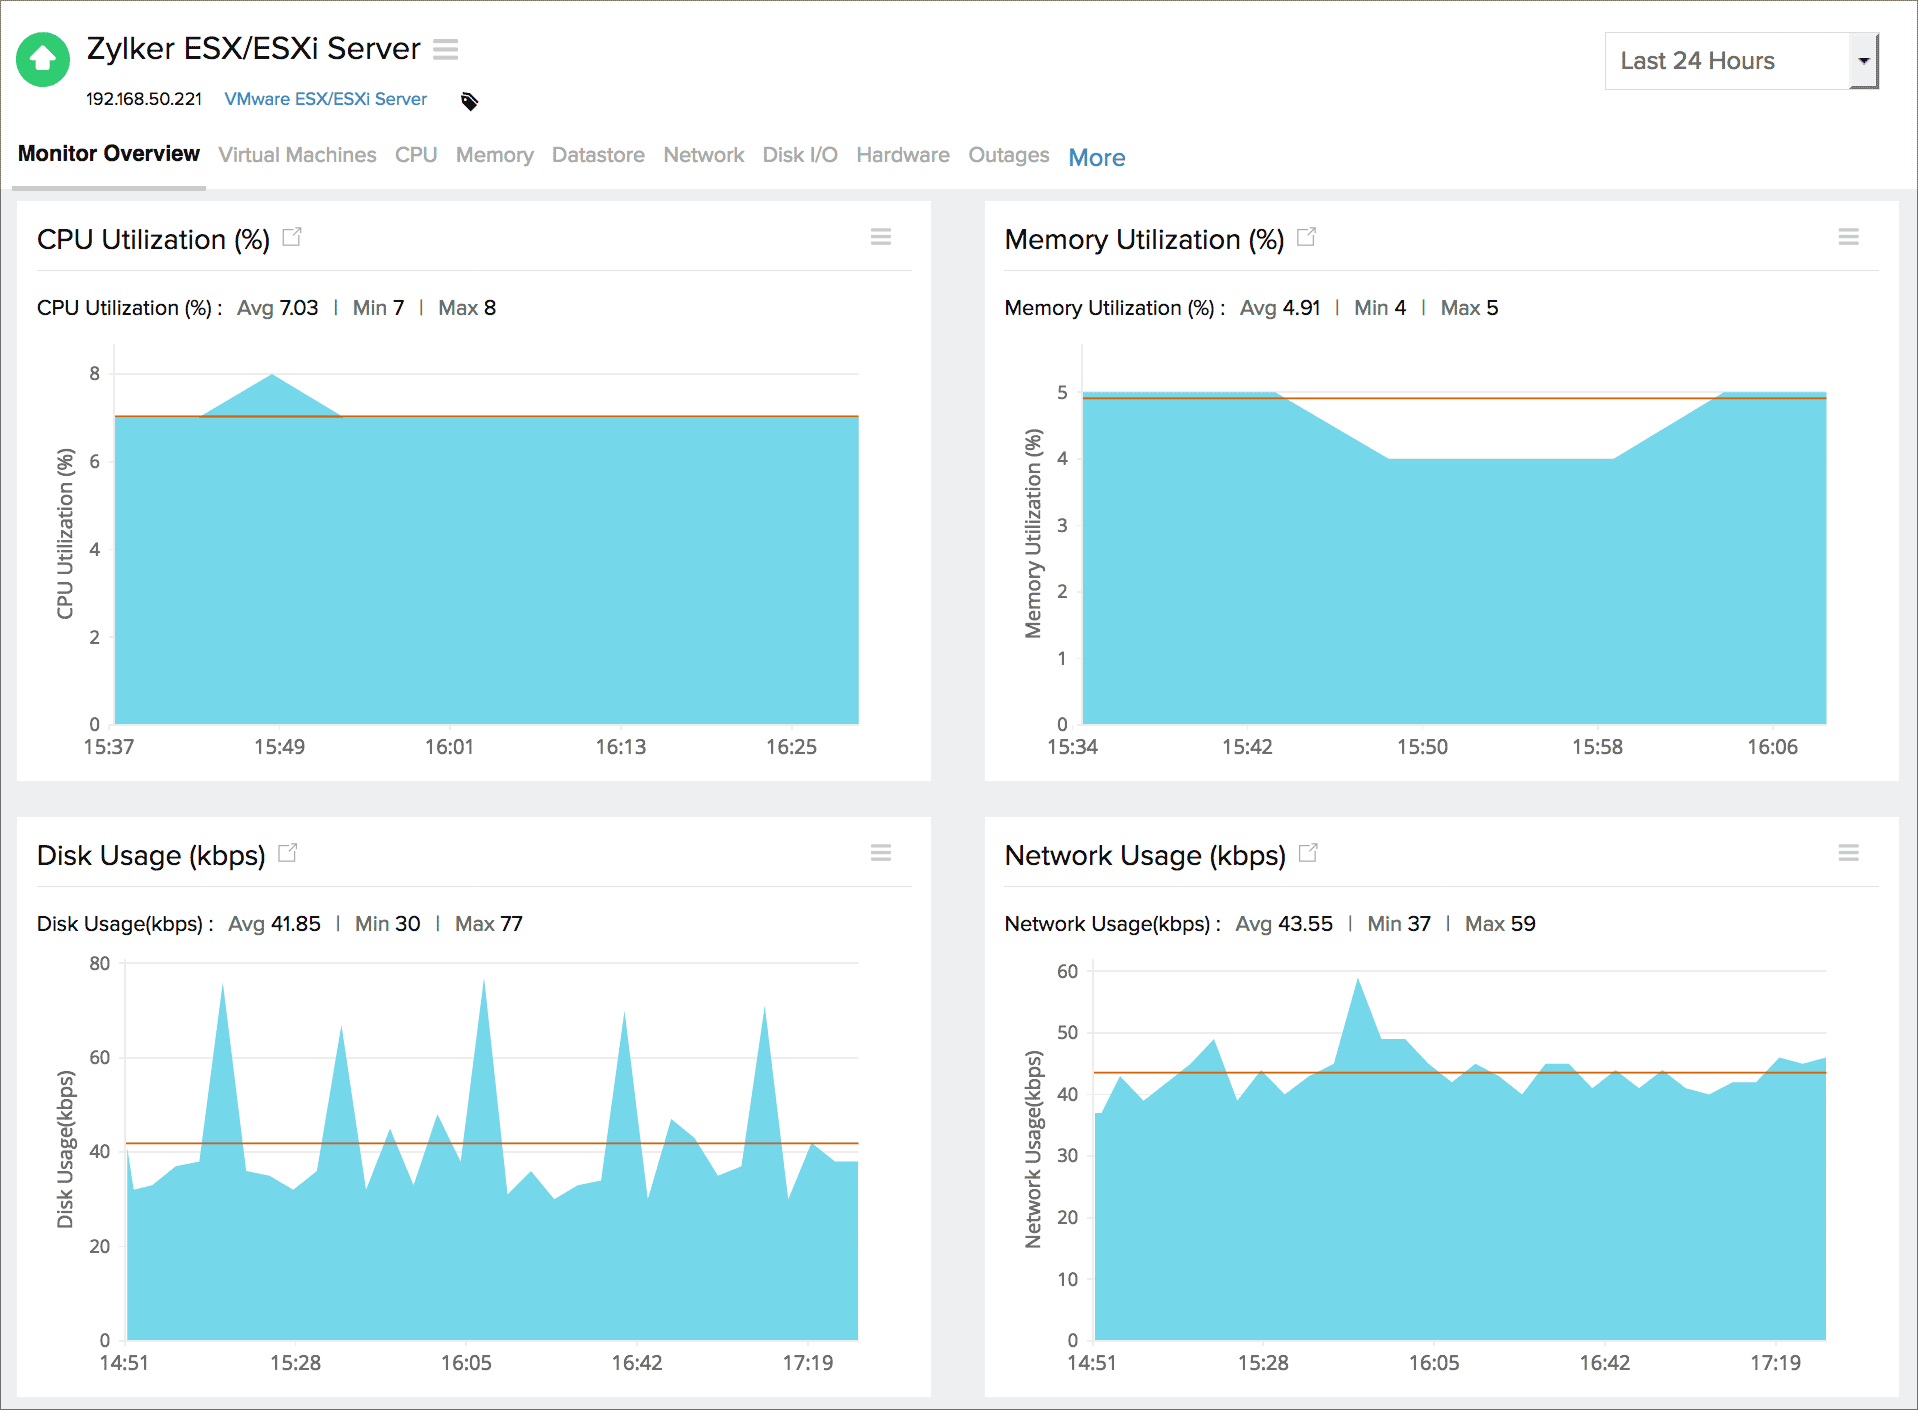 Performance Metrics of VMware ESX/ESXi monitor | Online Help Site24x7